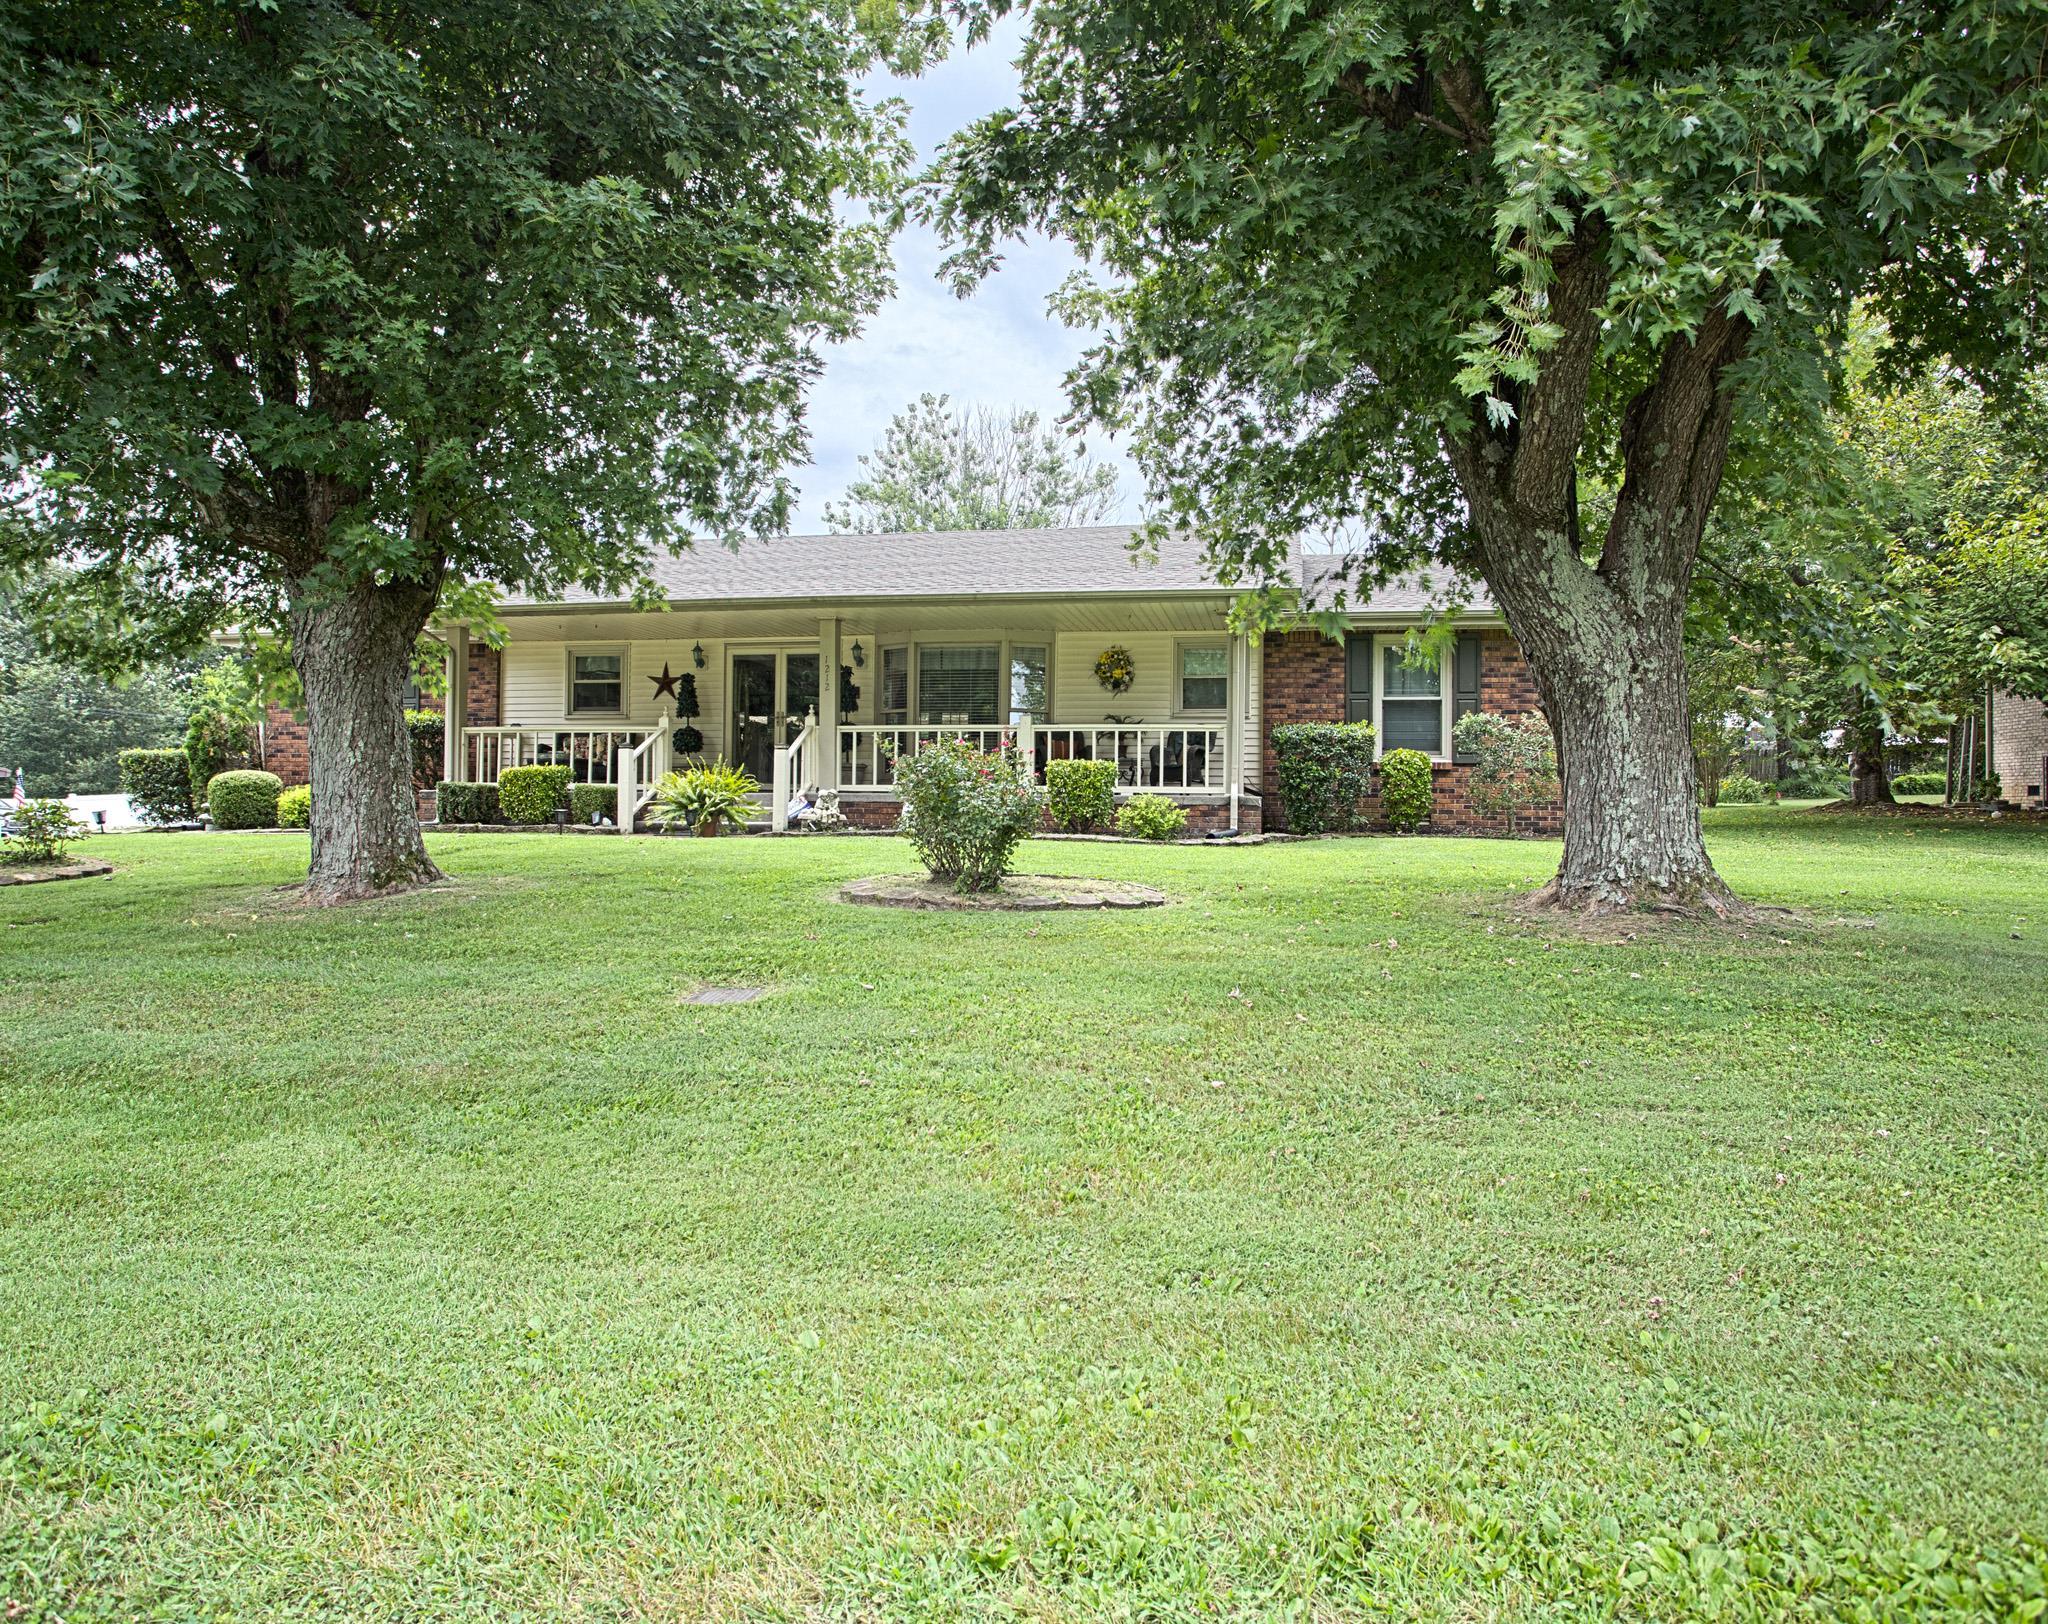 1212 Mayes Dr, Greenbrier, TN 37073 - Greenbrier, TN real estate listing